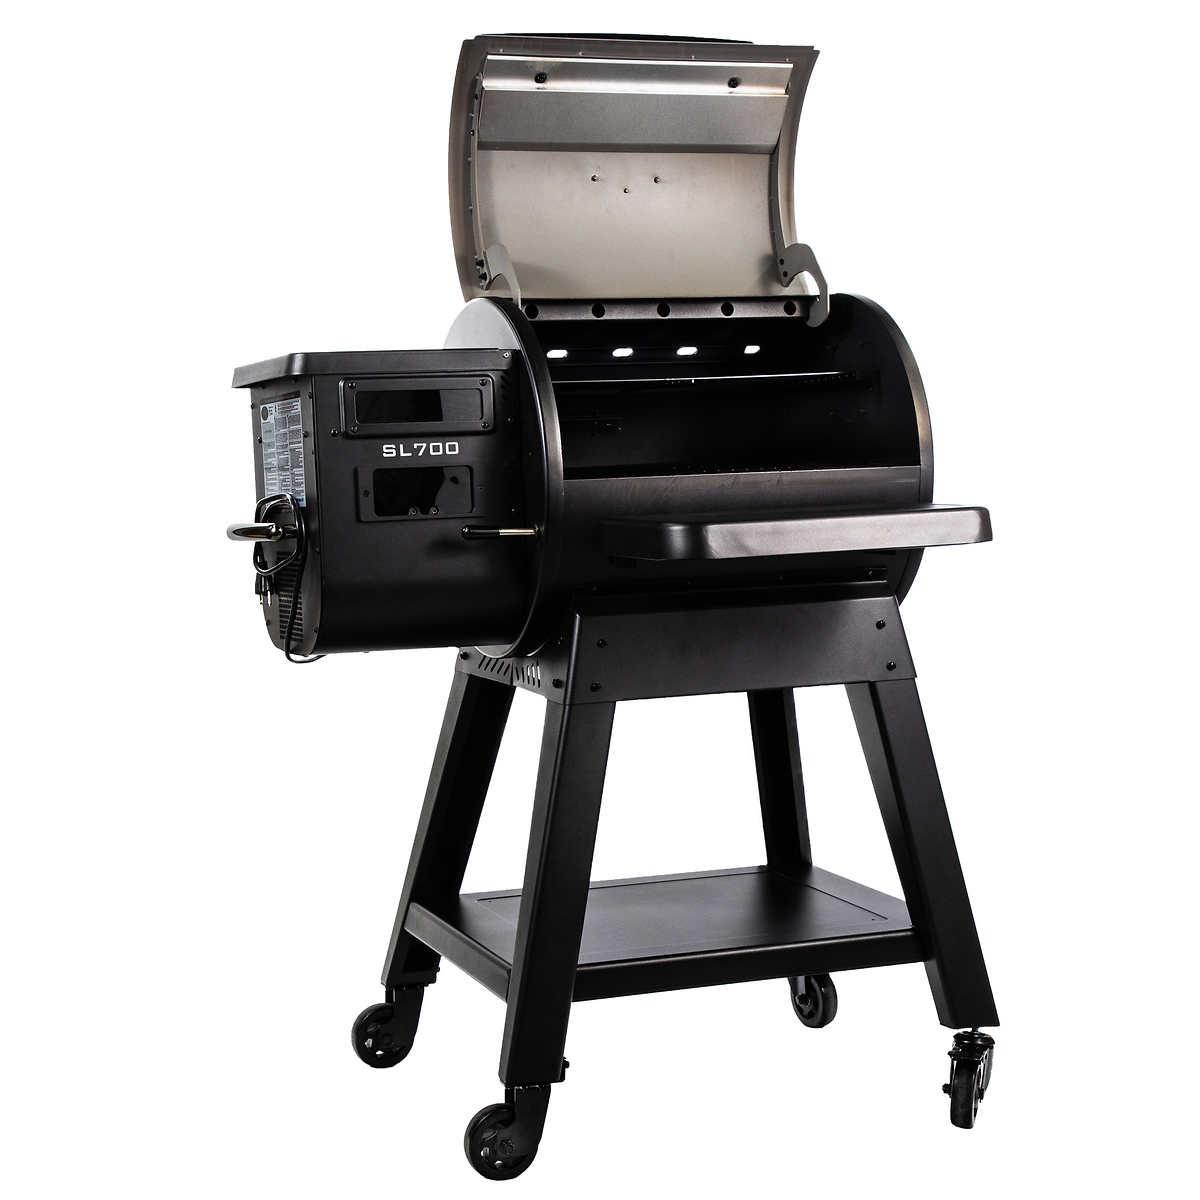 Louisiana Grills SL700 smoker $300 (Costco, YMMV) $299.98